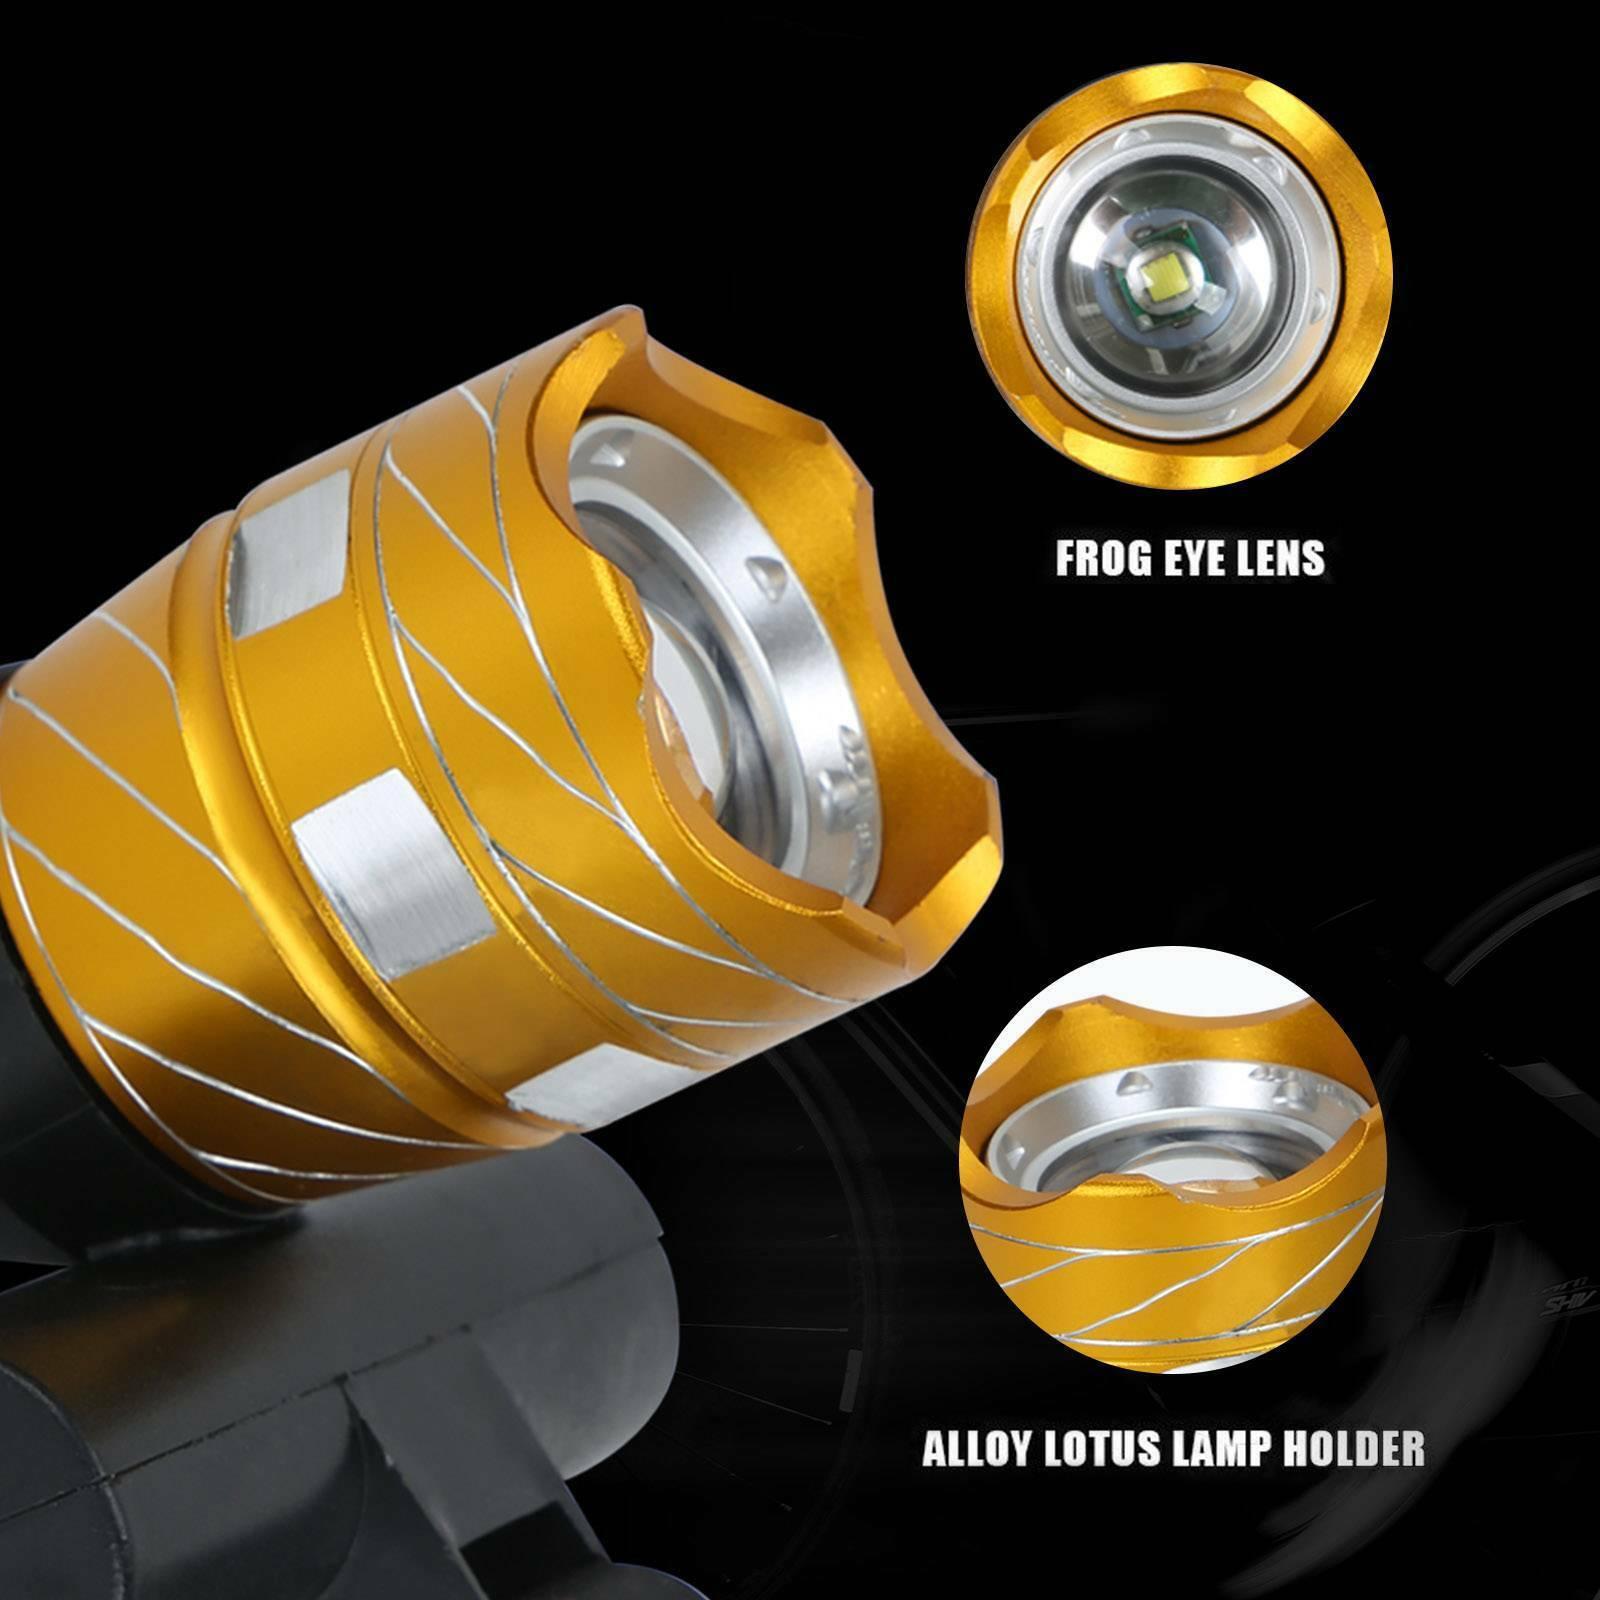 CREE XM-L T6 15LED 3Mode Bicycle Lamp Bike Light Headlight Cycling TorchLight UK